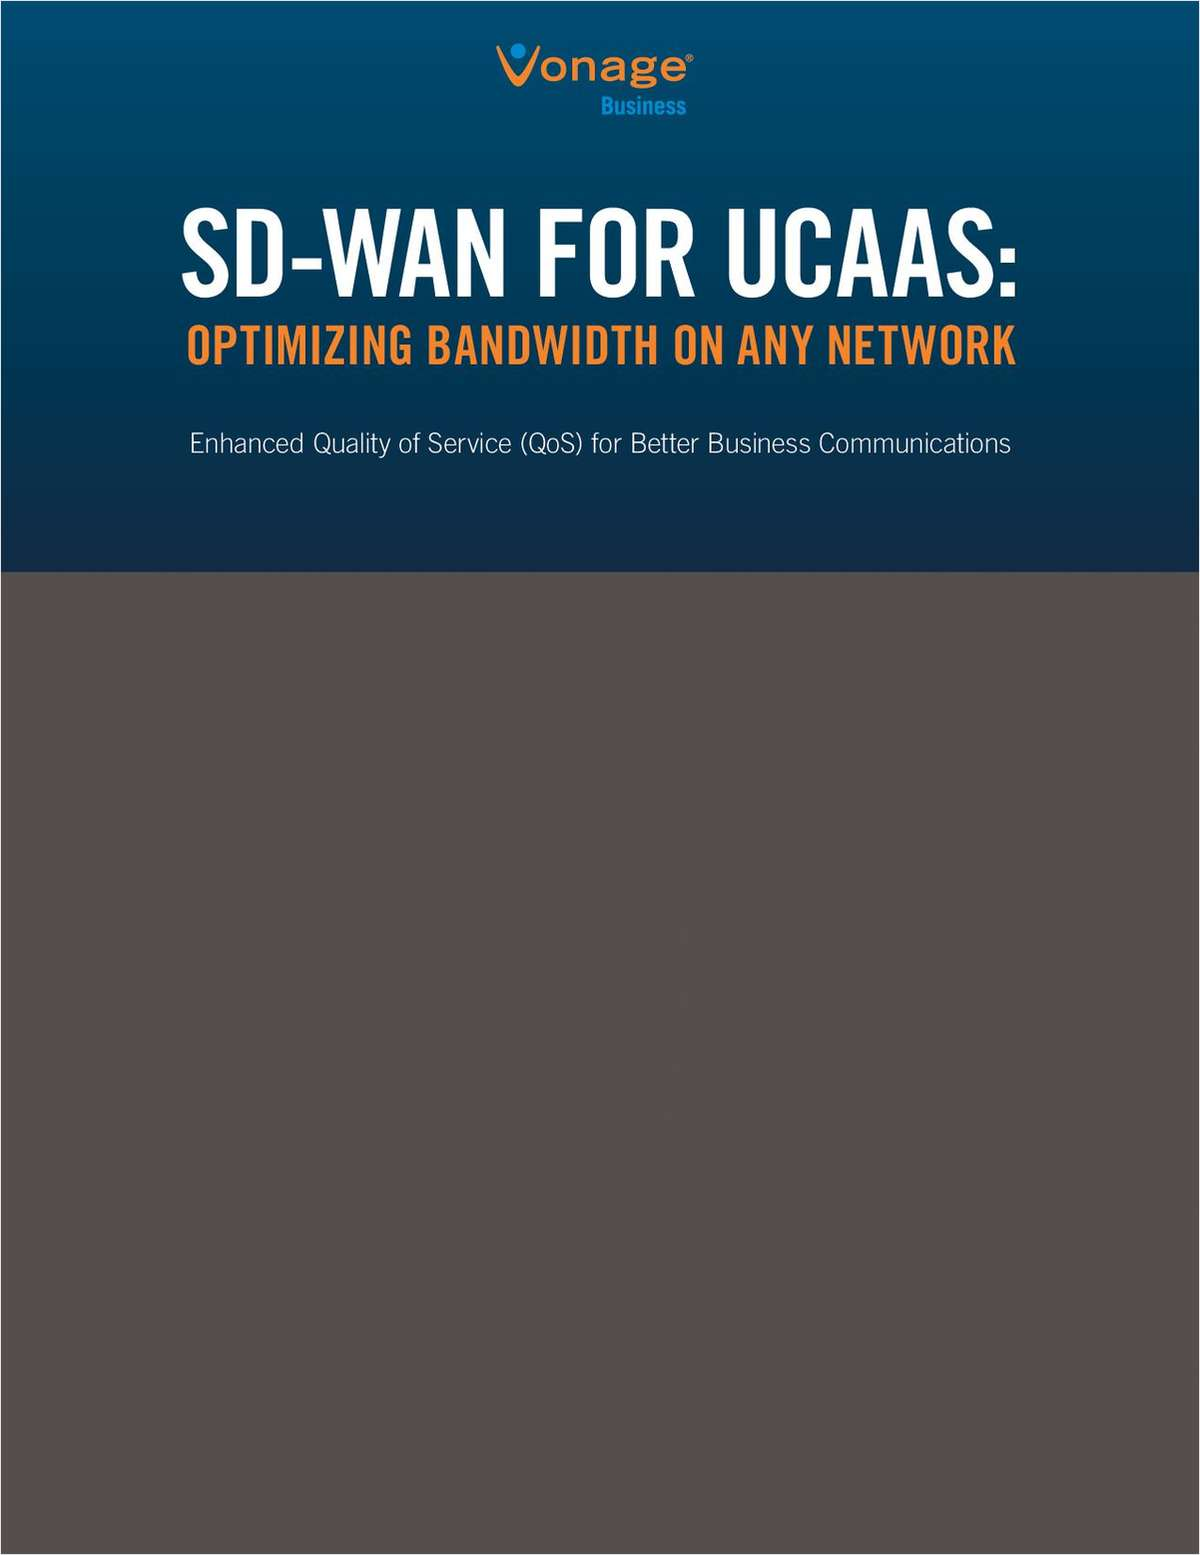 SD-WAN for UCaaS: Optimizing Bandwidth on Any Network